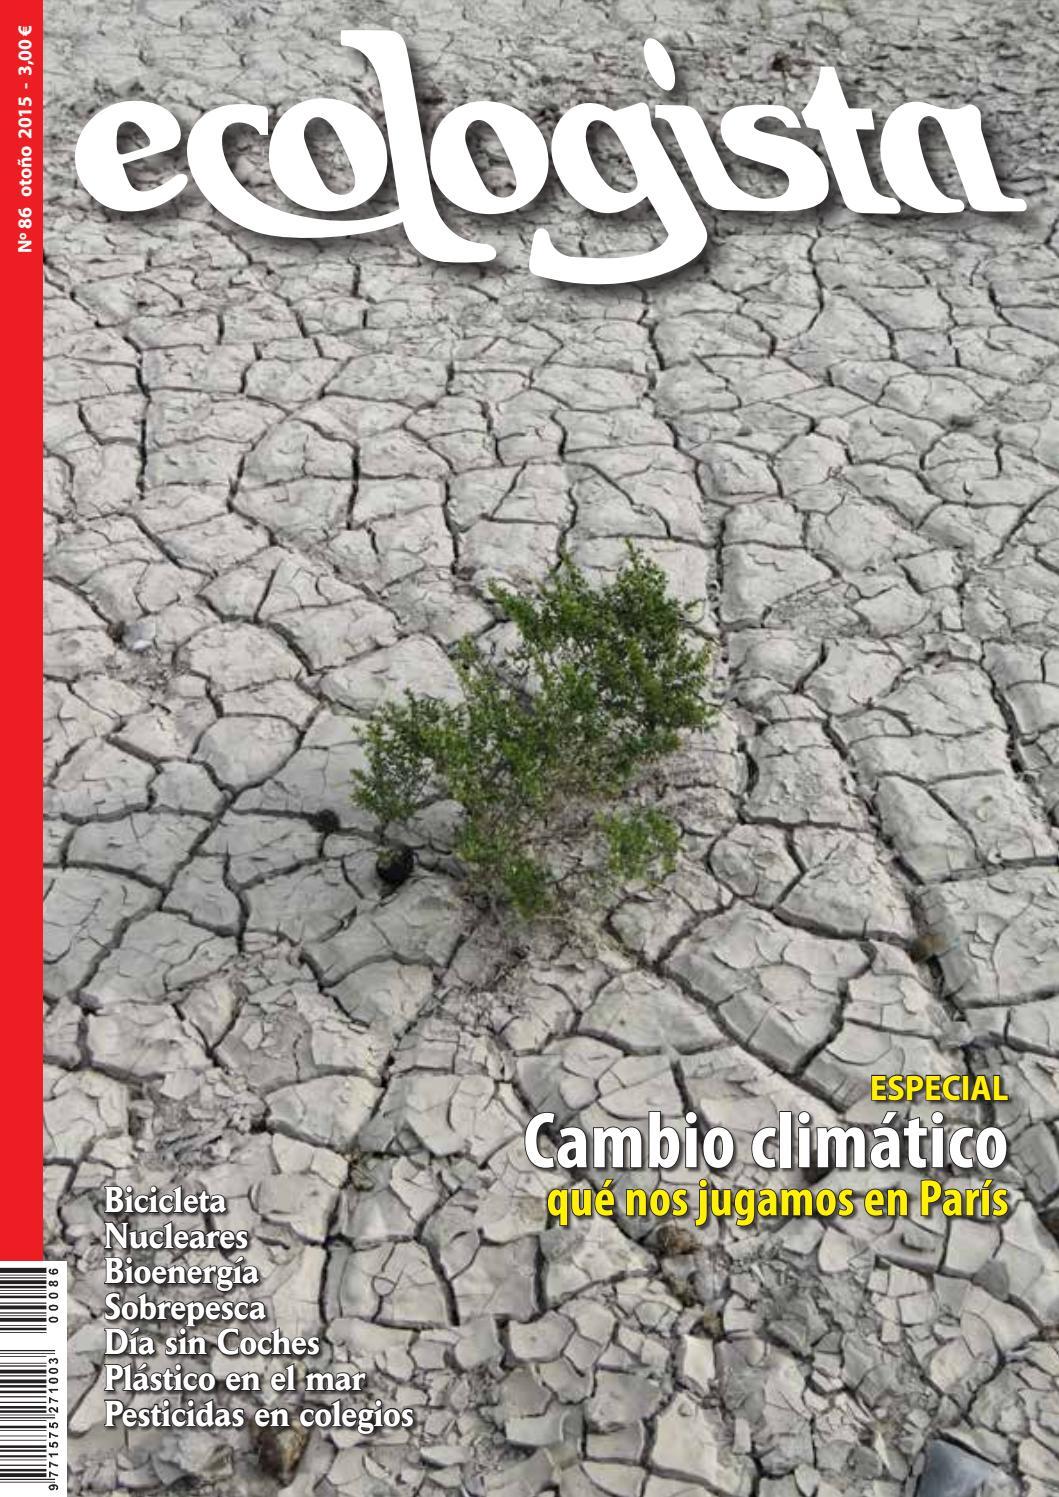 Ecologista nº 86 by Revista El Ecologista - issuu